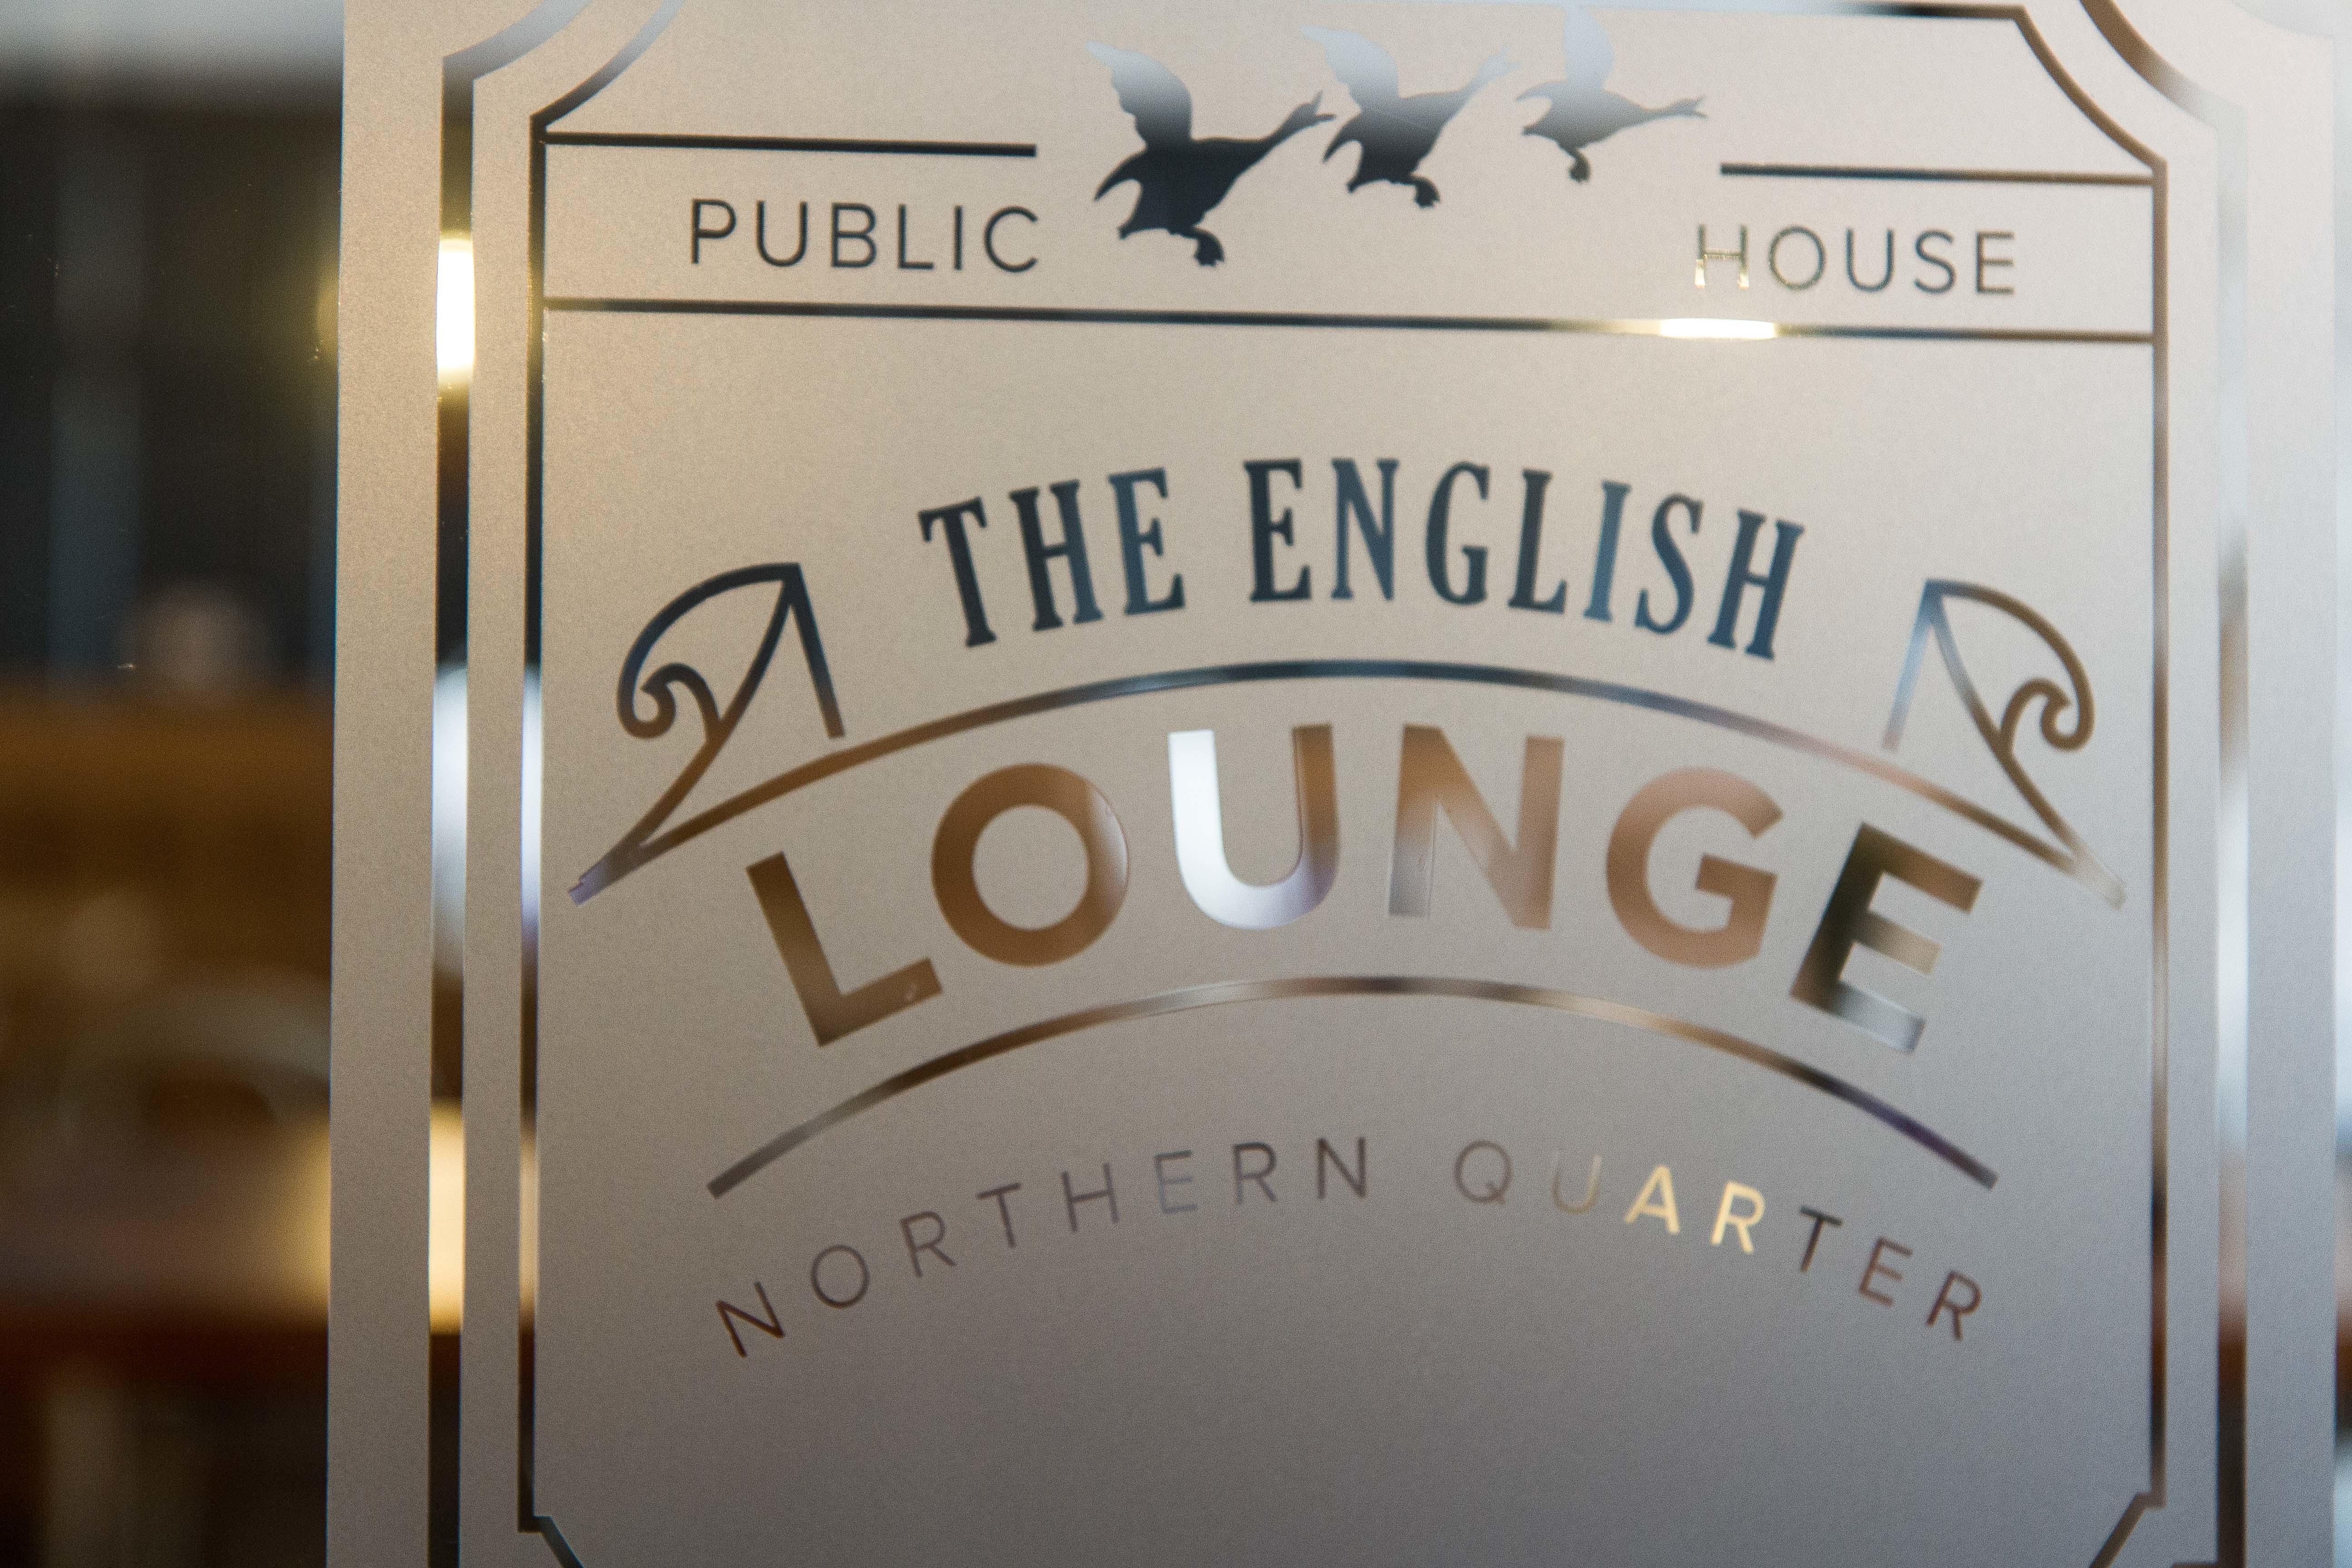 The English Lounge